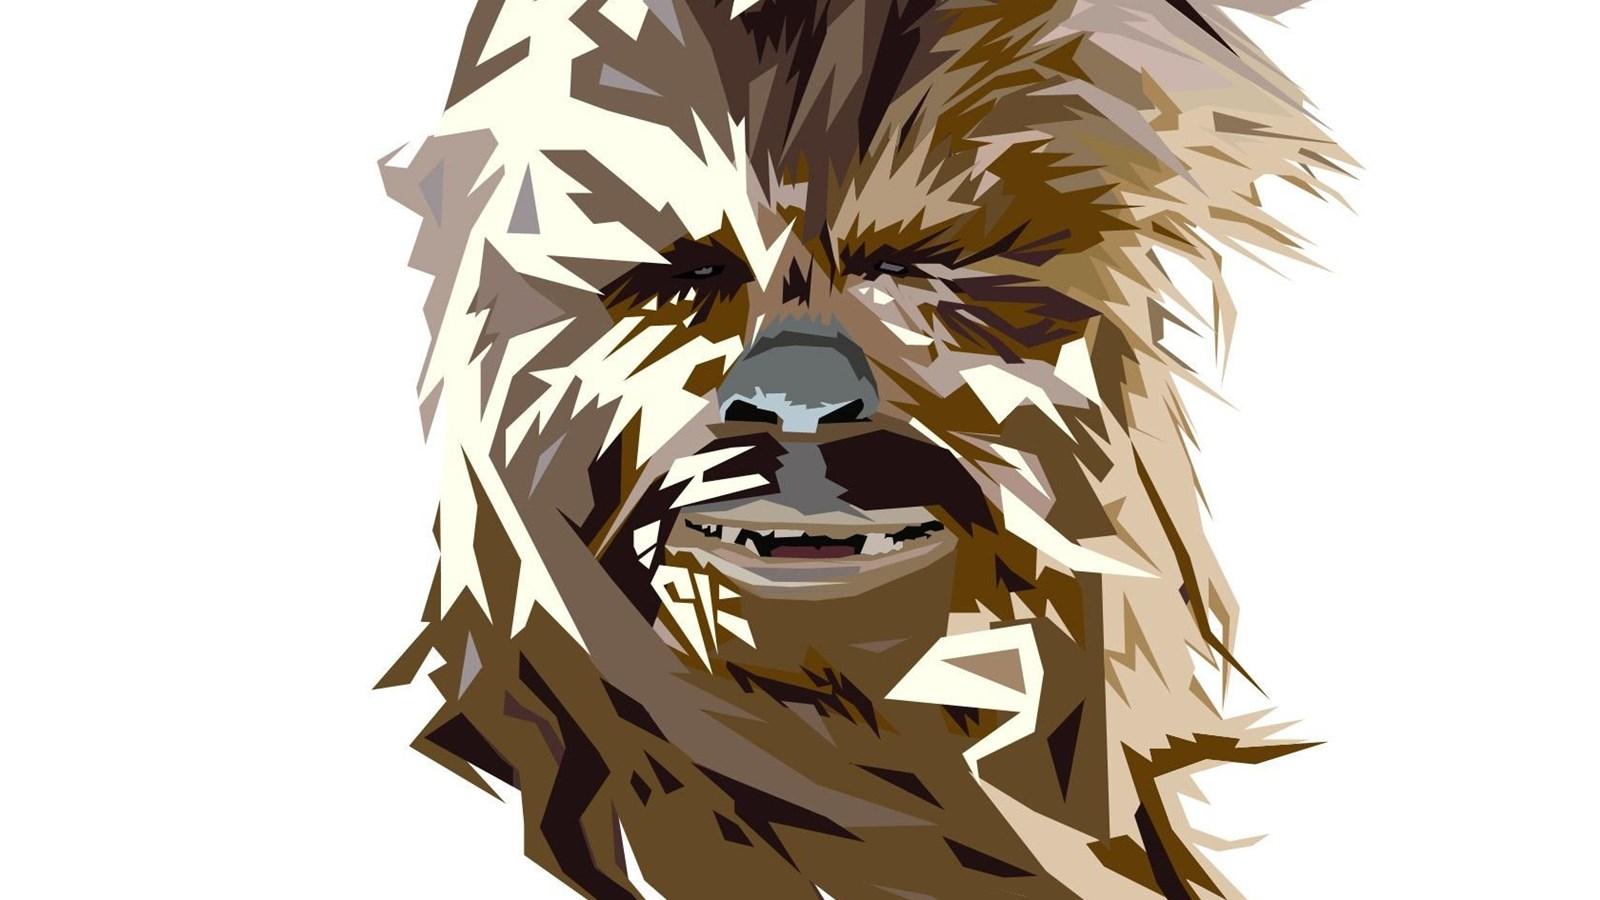 Chewbacca Wallpapers Imgur Desktop Background